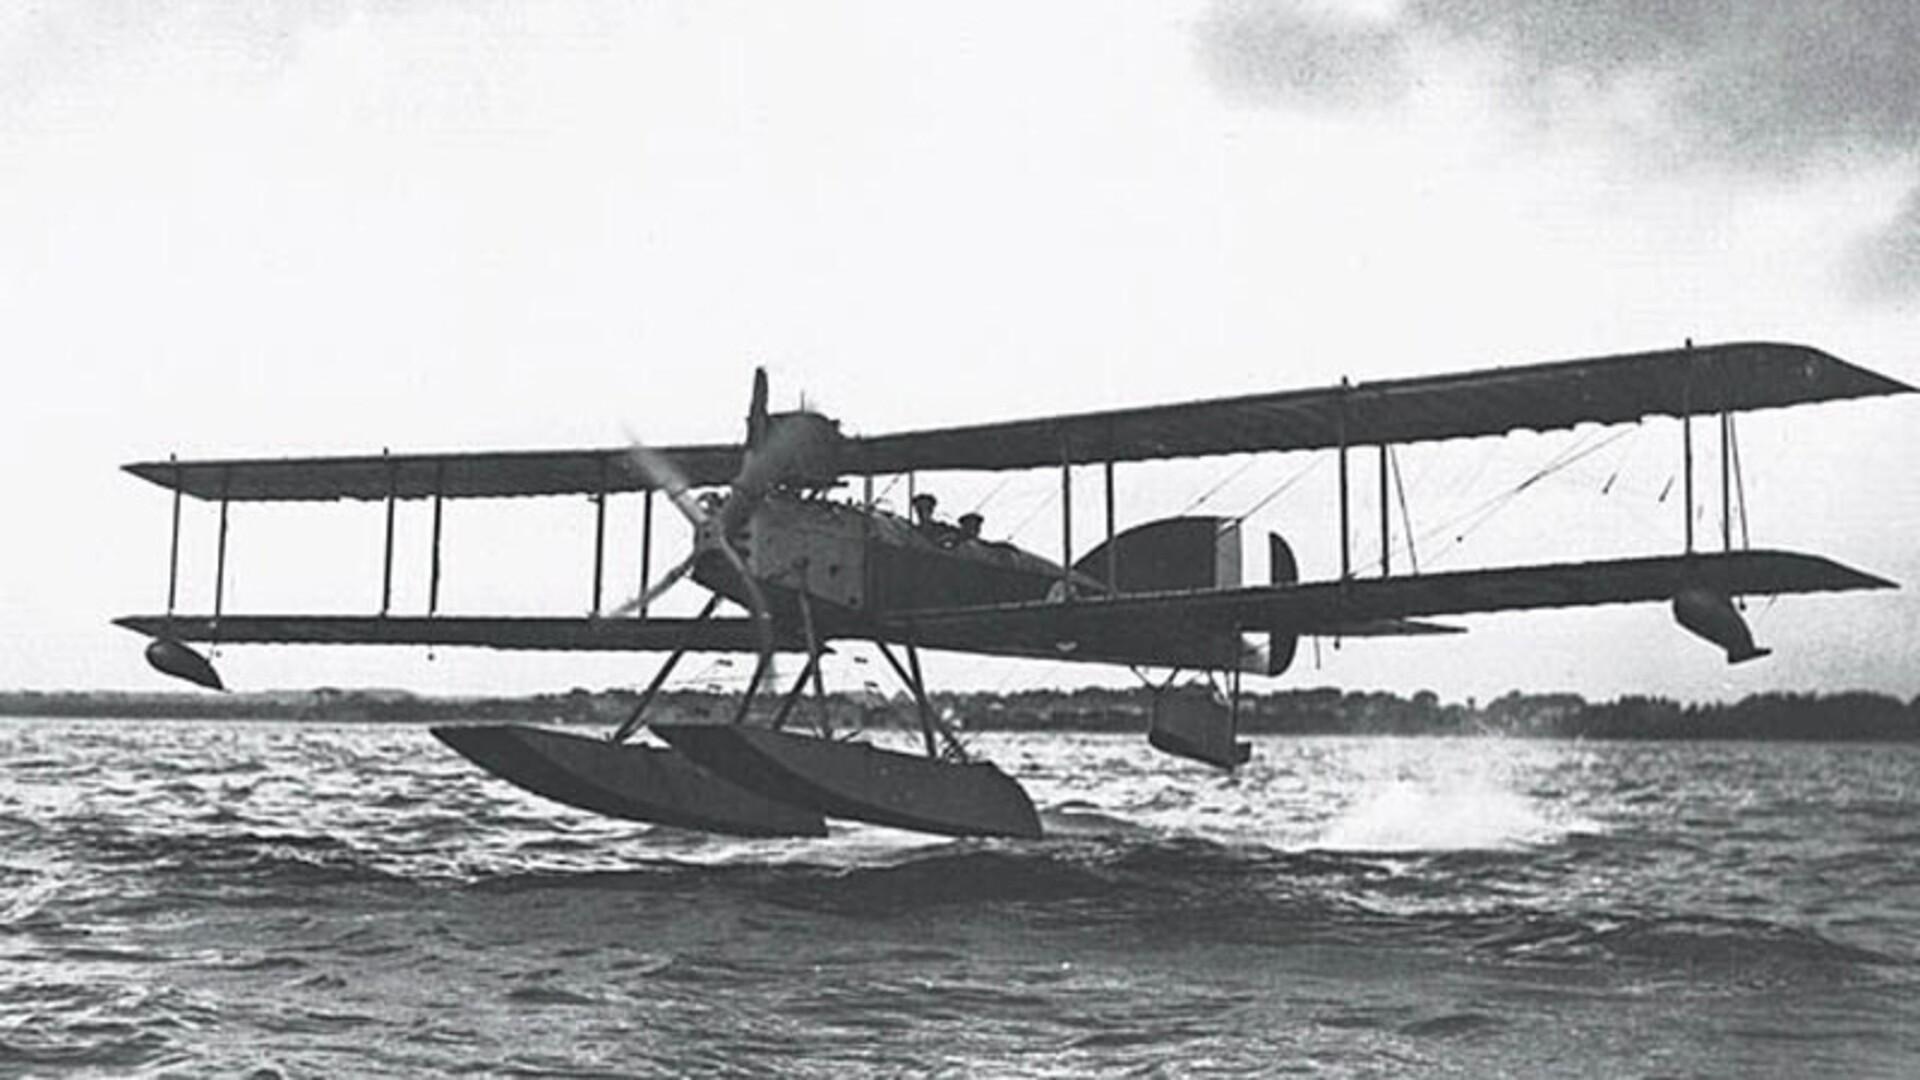 The Seaplane